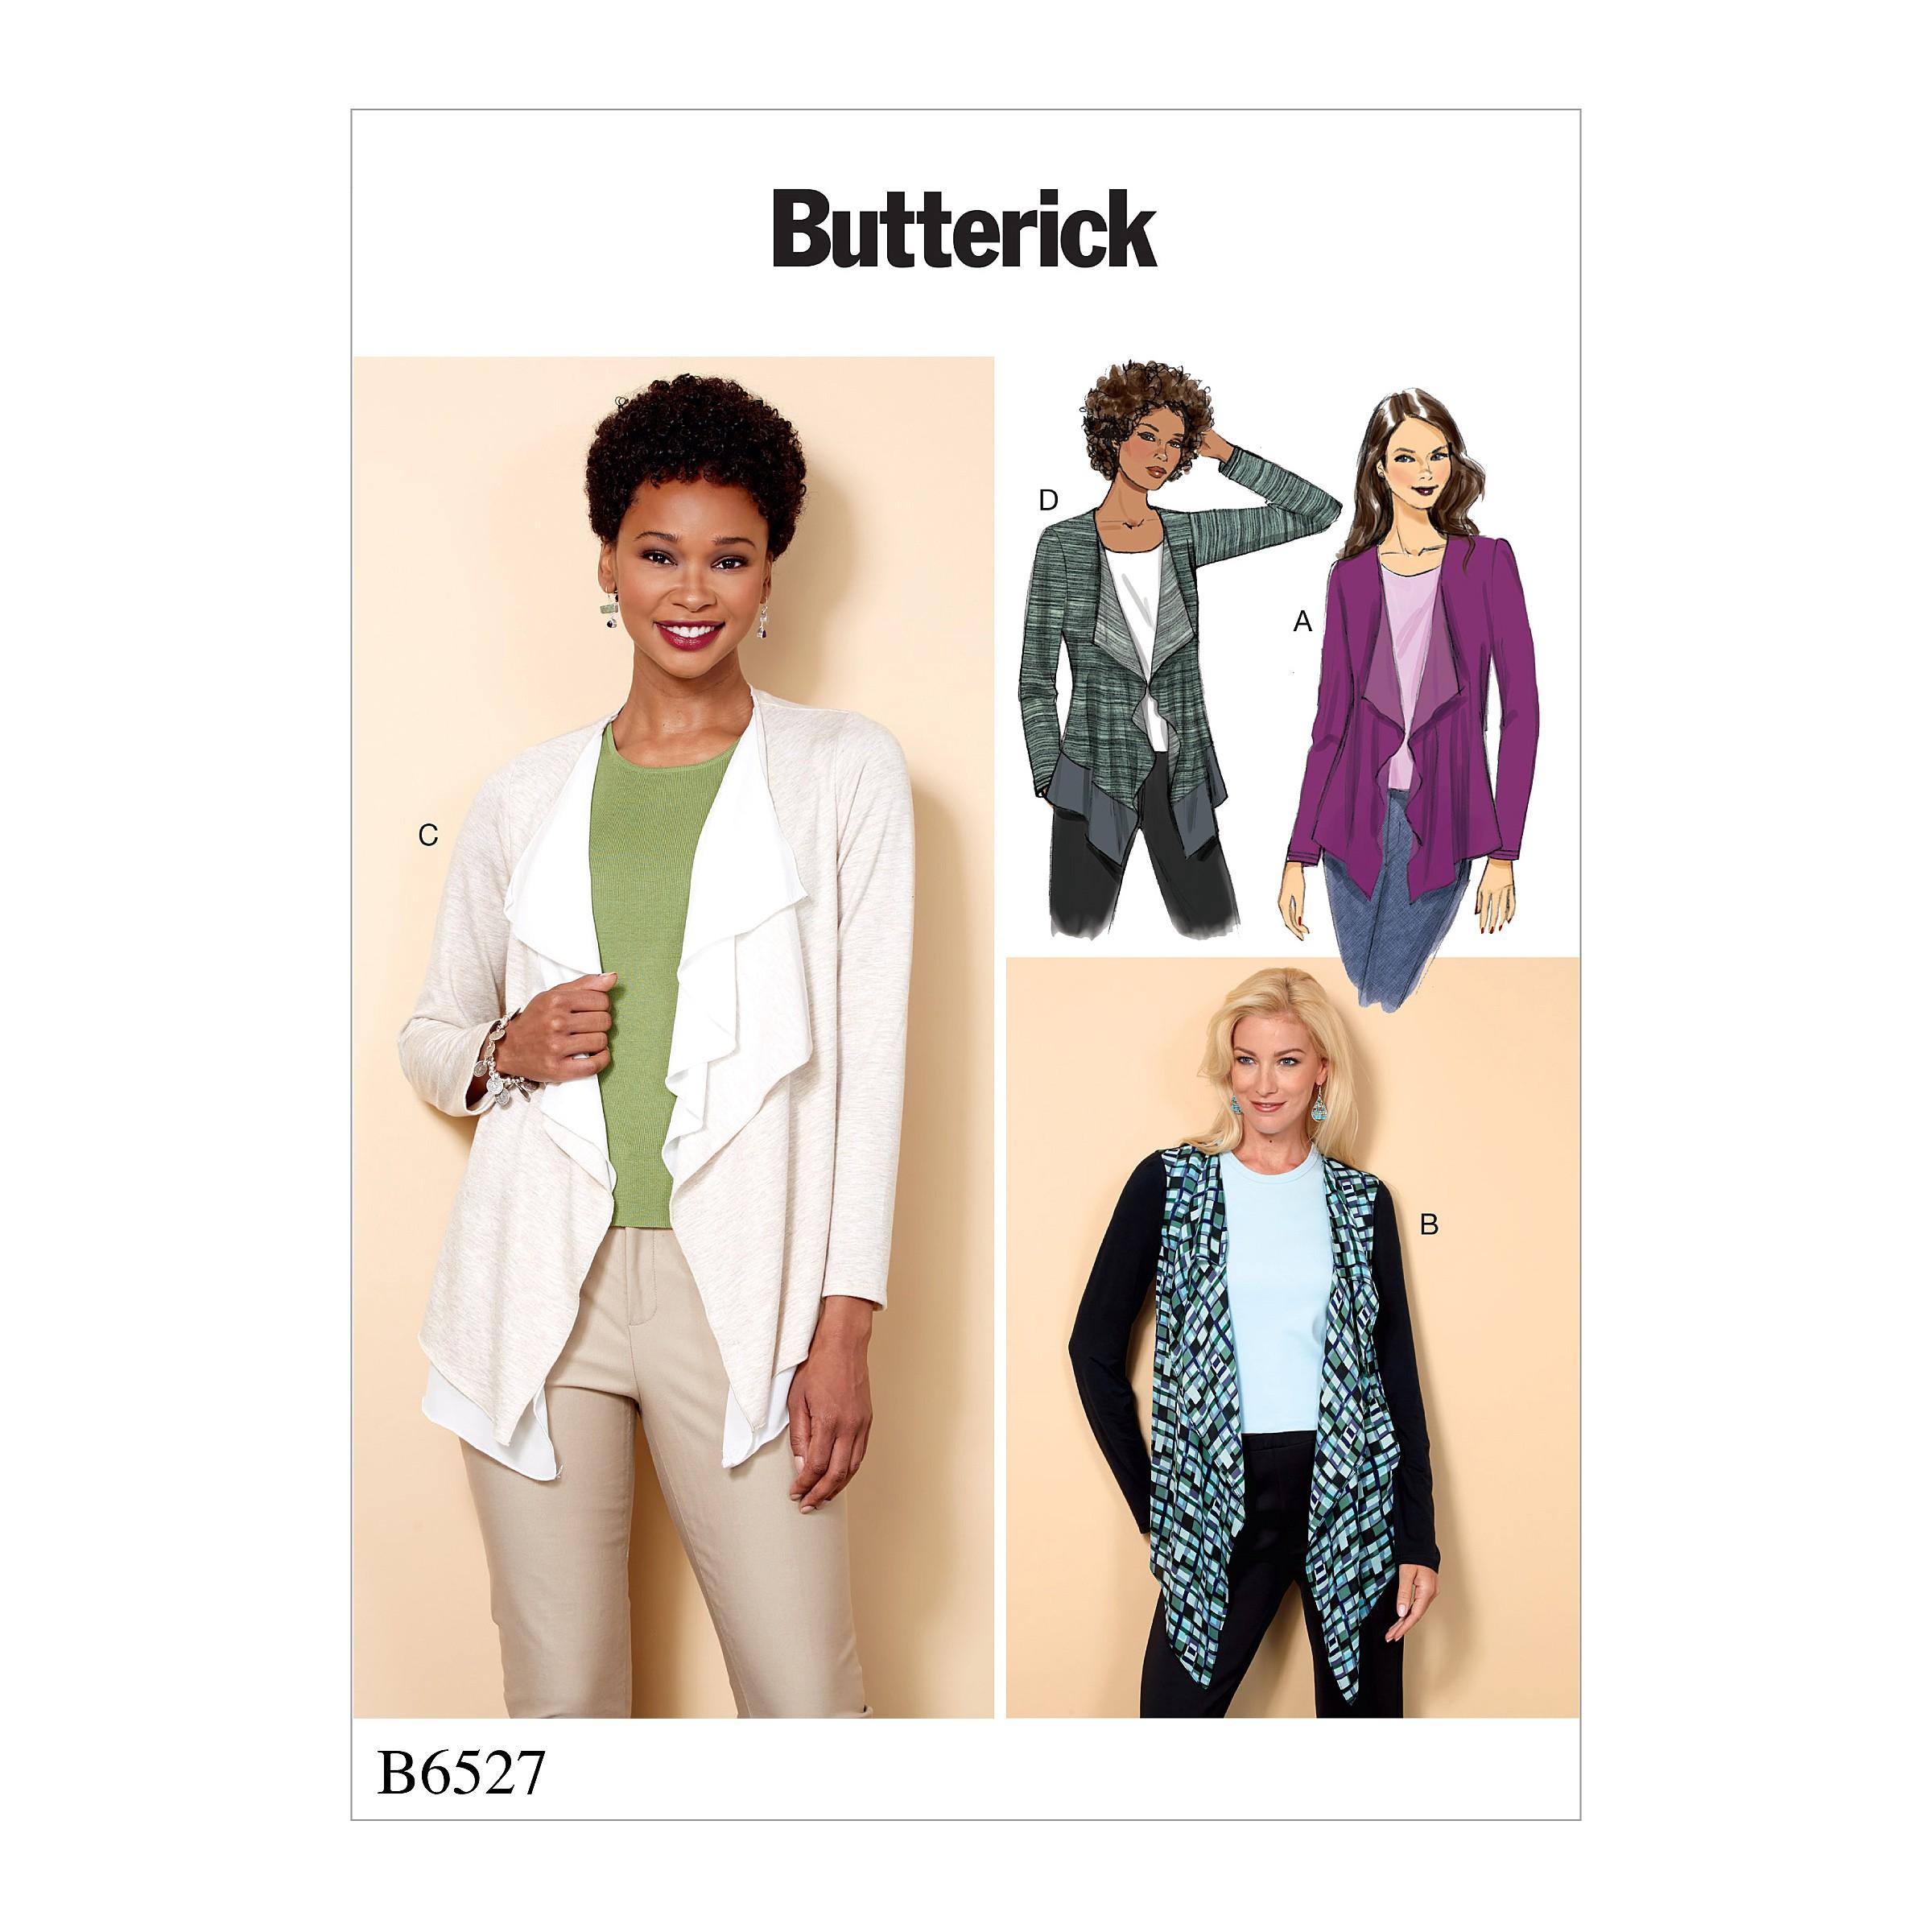 Butterick Sewing Pattern 6527 Misses' Cascade-Collar Knit Jacket